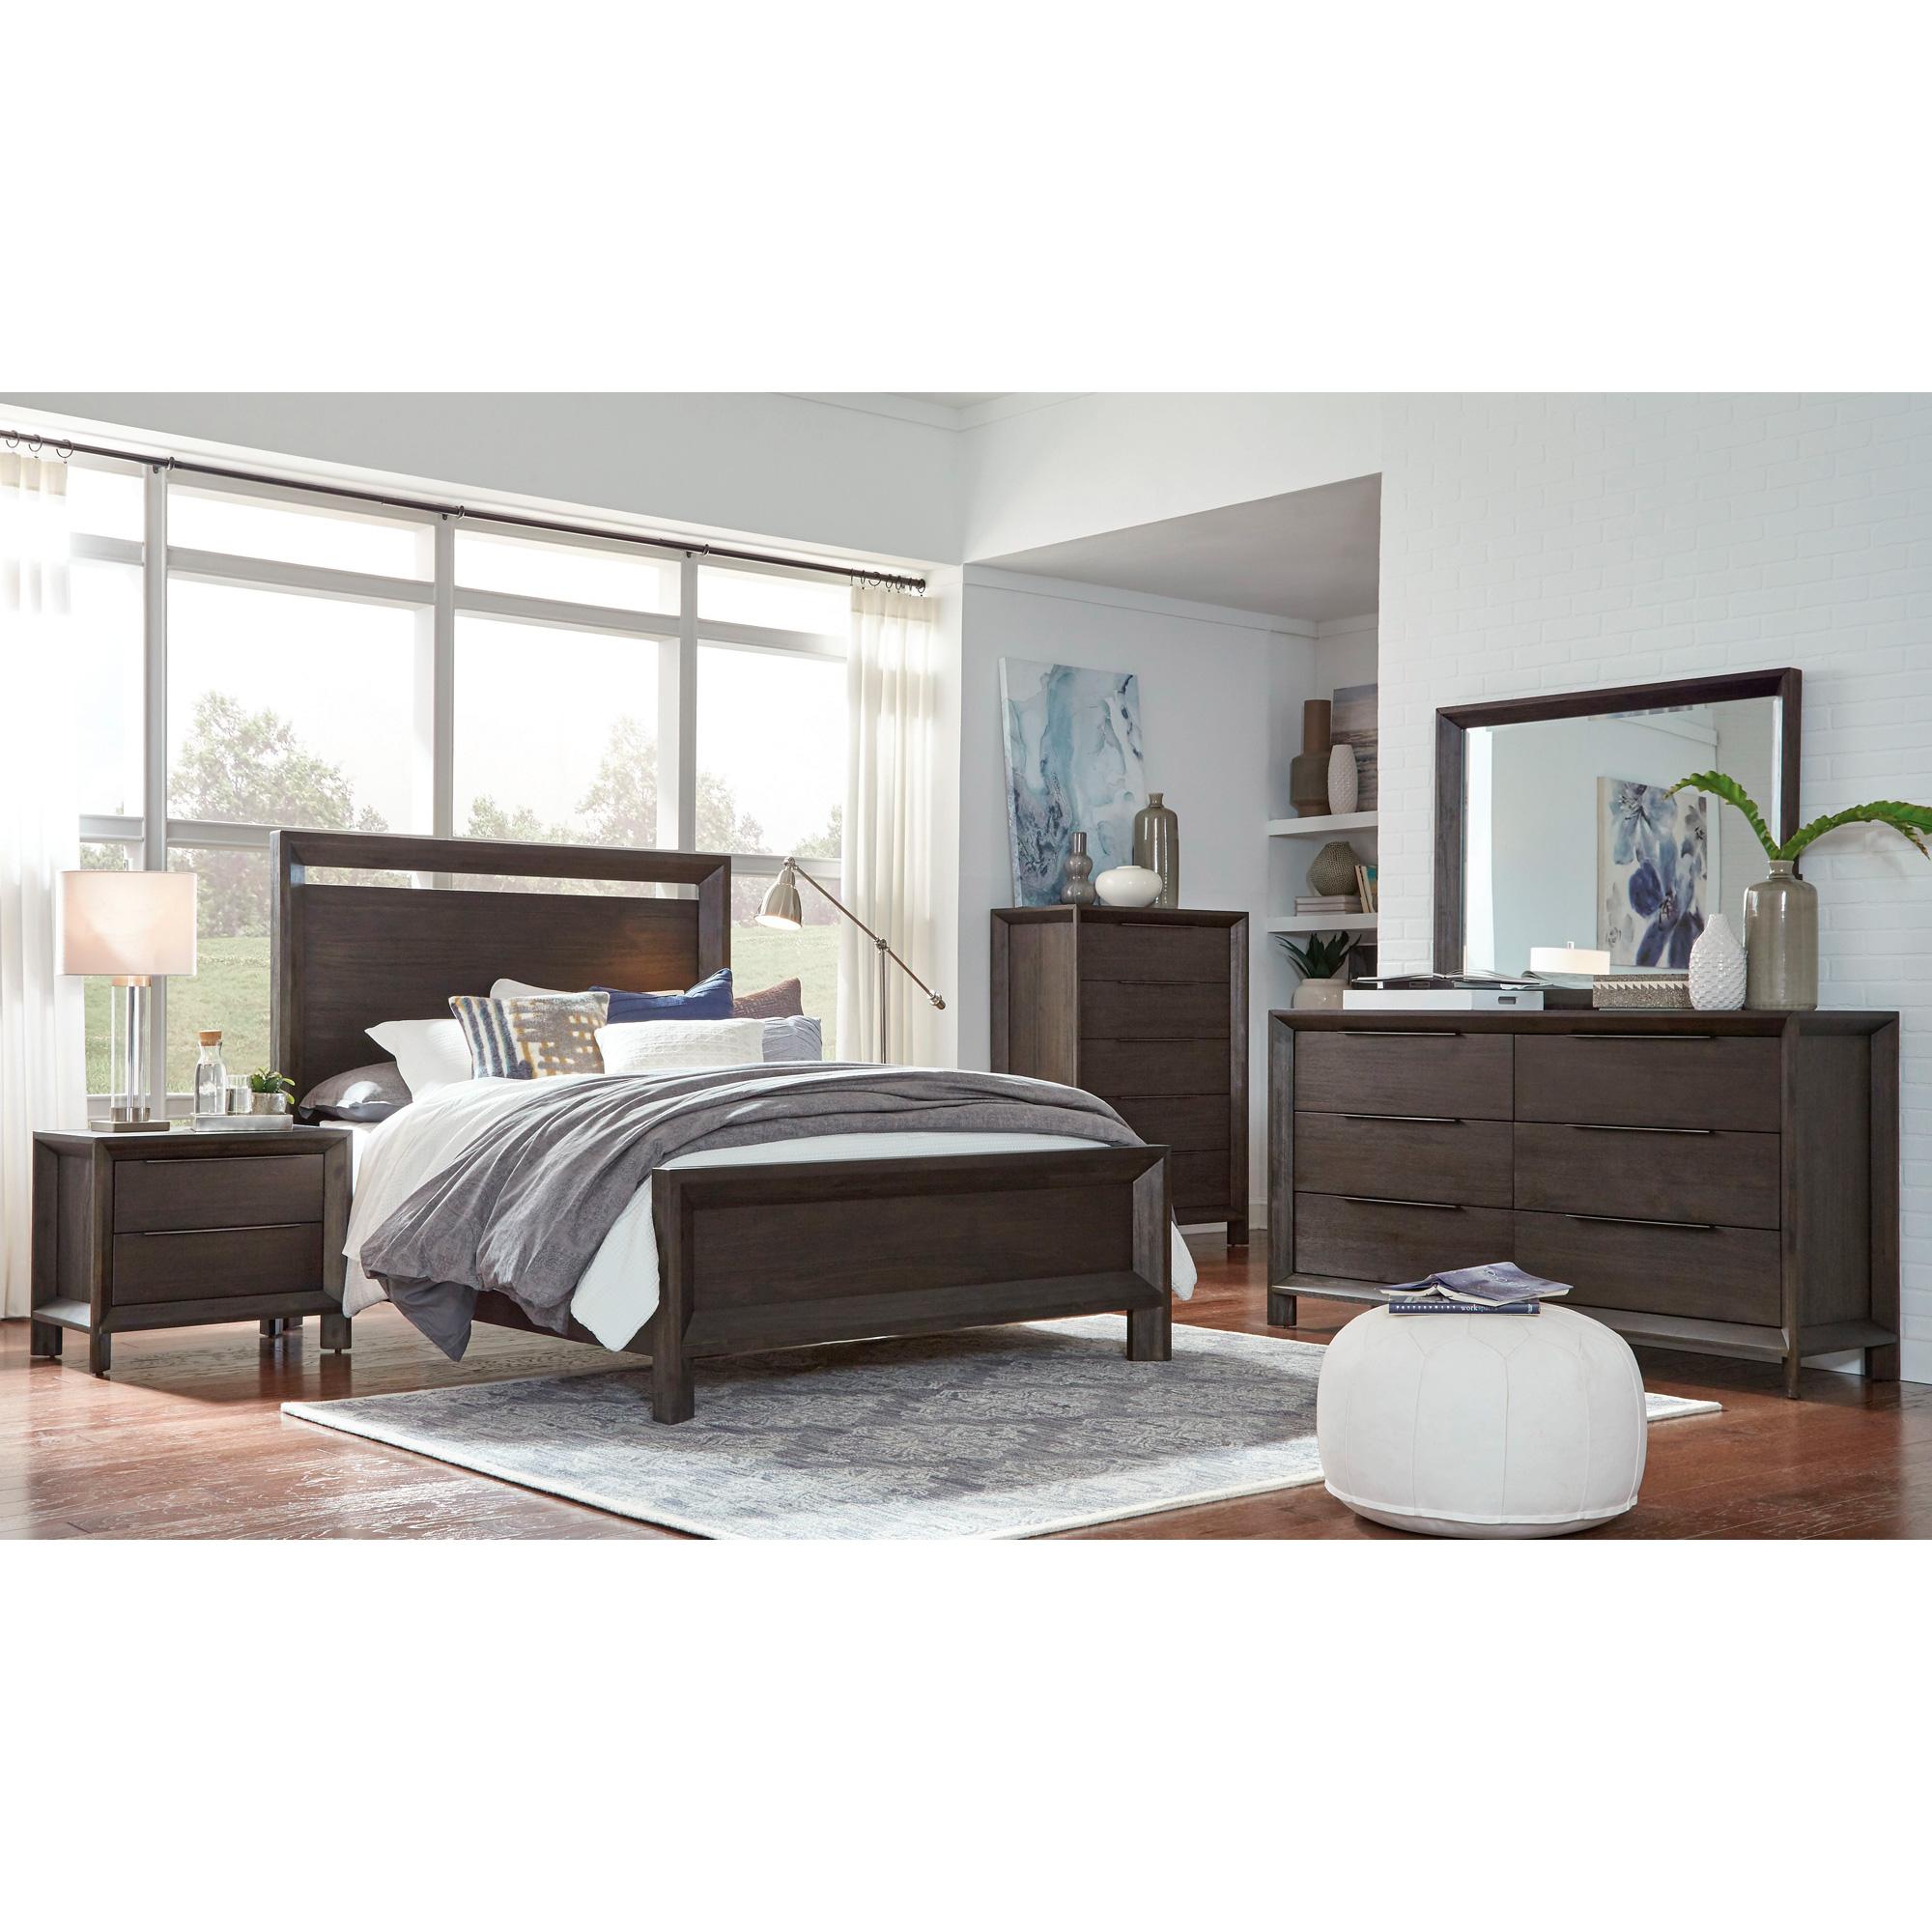 Modus Furniture International | Chloe Basalt Gray Full 4 Piece Room Group Bedroom Set